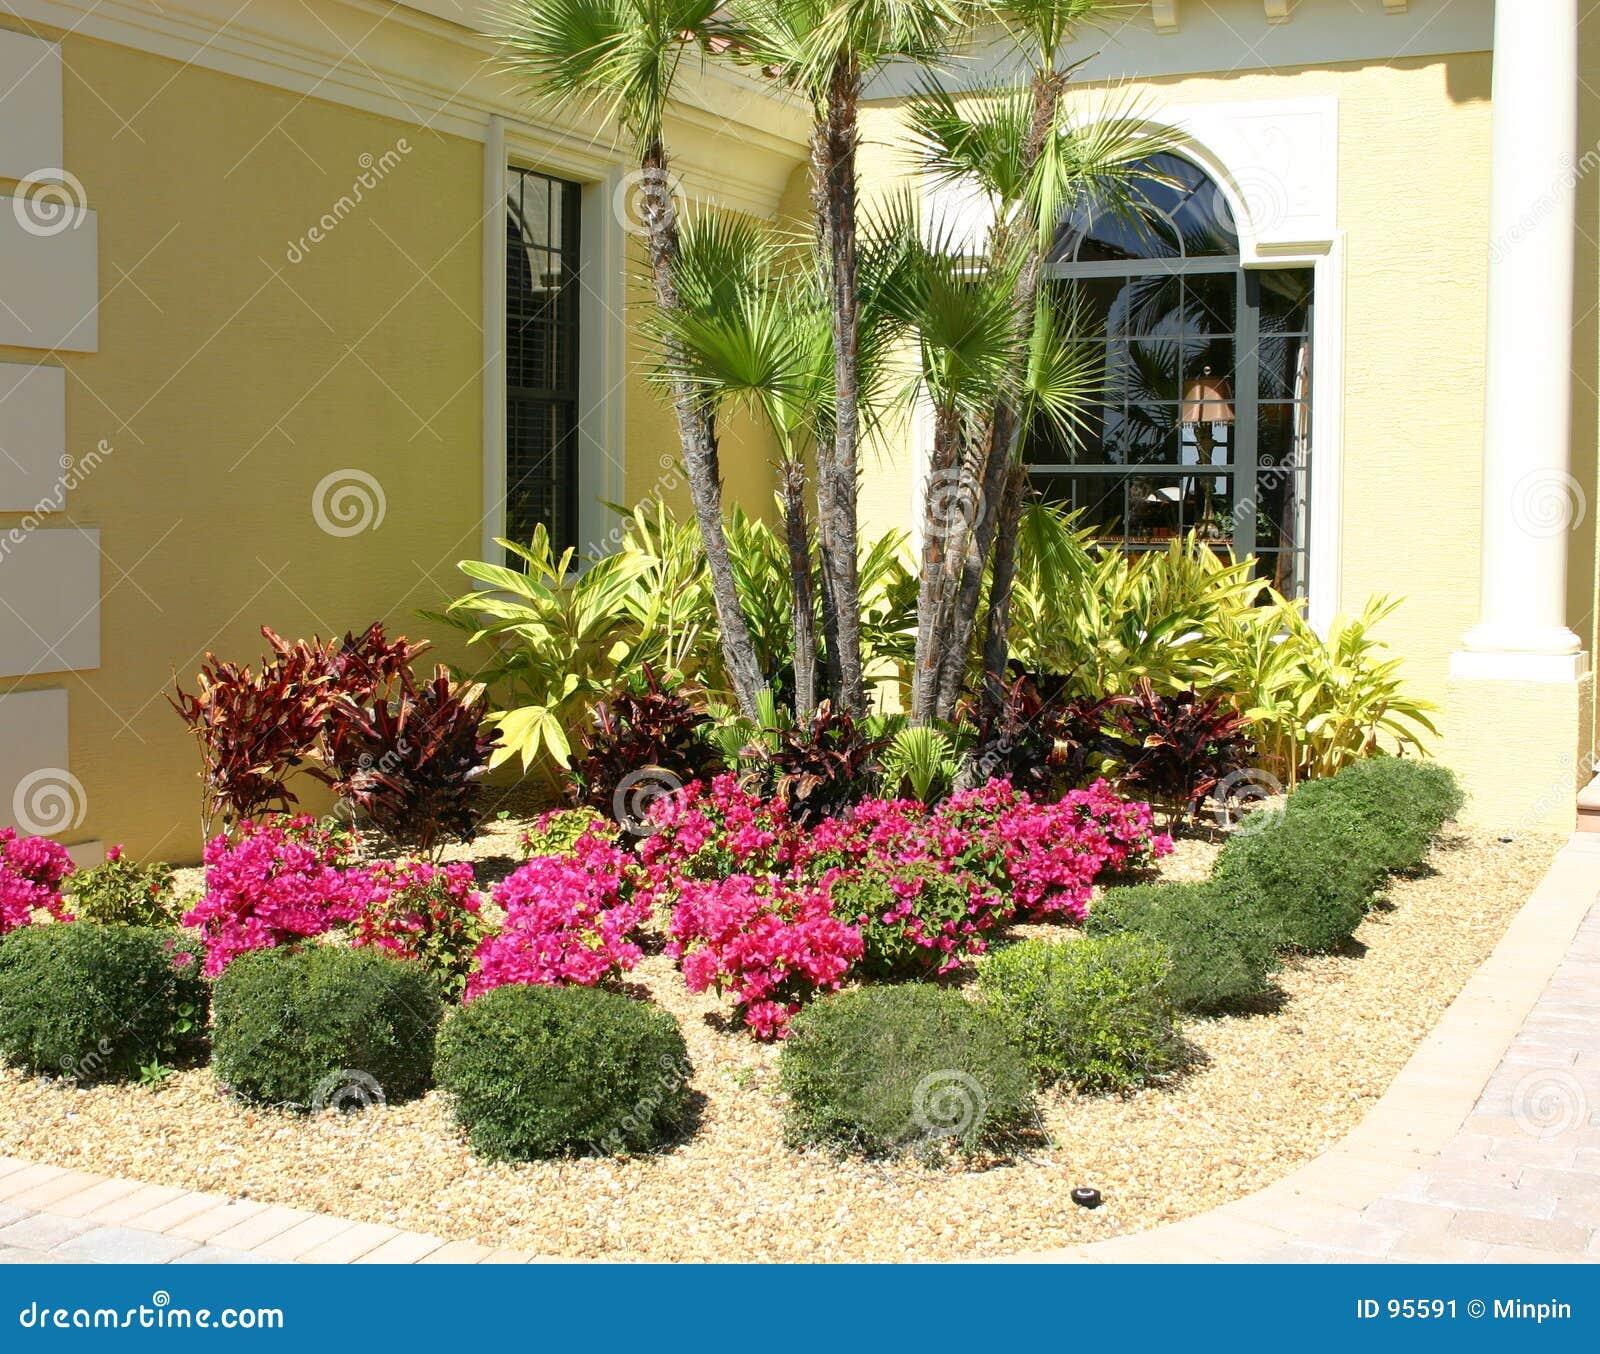 Corner Floral Garden Area: Flower Garden Stock Image. Image Of Stonebed, Corner, Palm